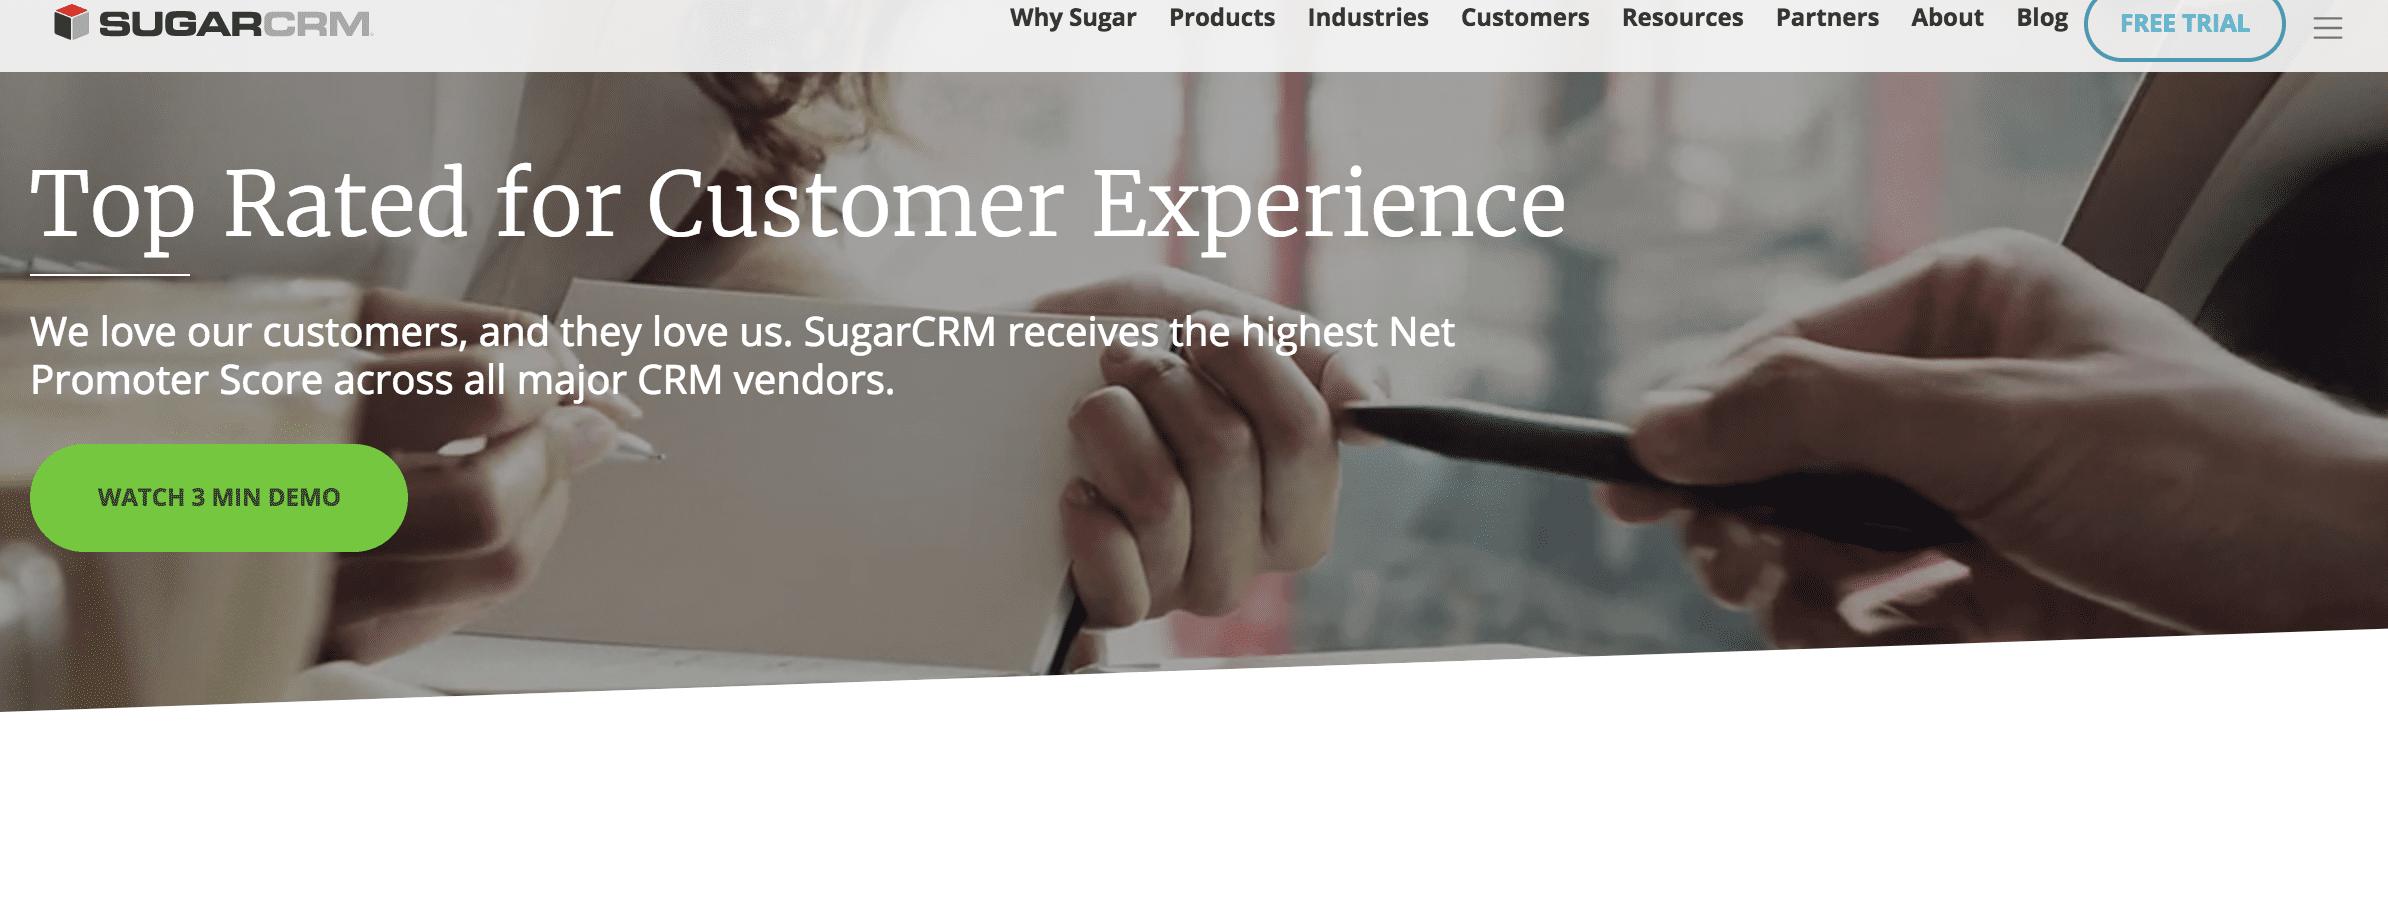 SugarCRMCalendarIntegration